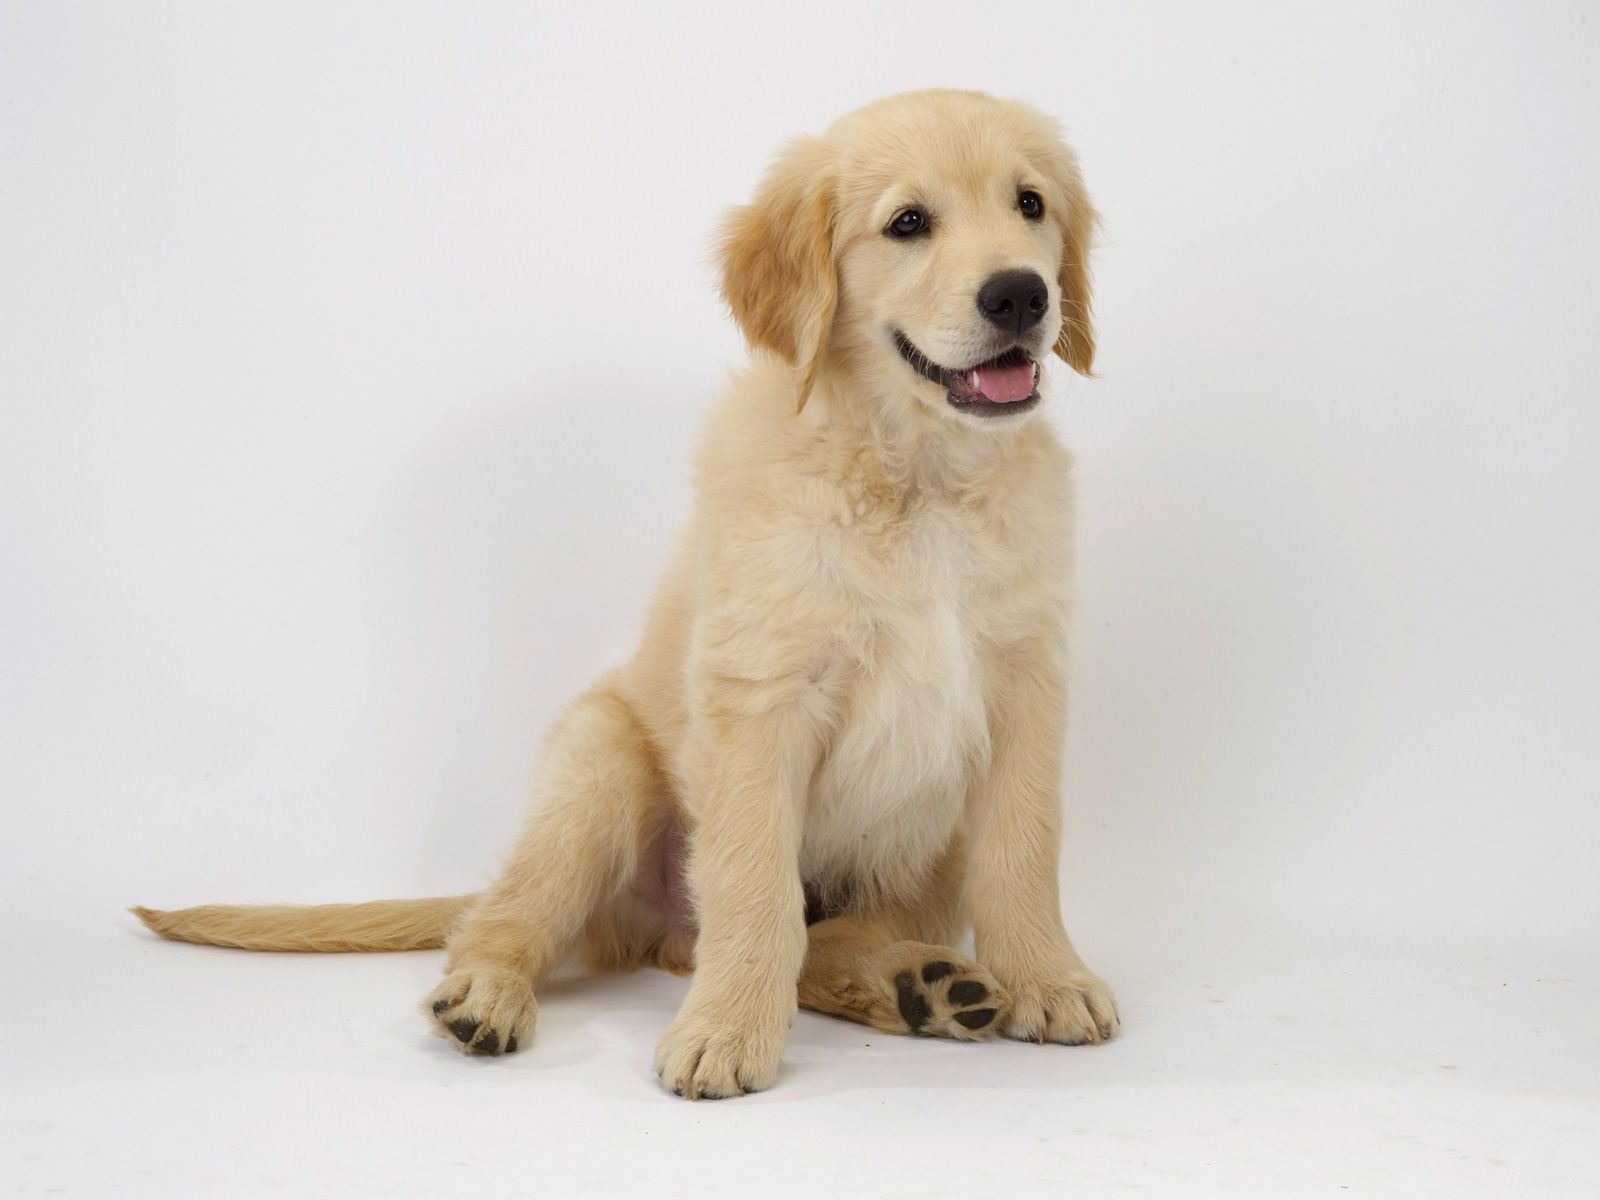 Golden Retriever Iphone Background Is 4k Wallpaper Golden Retriever Baby Golden Retriever Golden Retriever Puppy